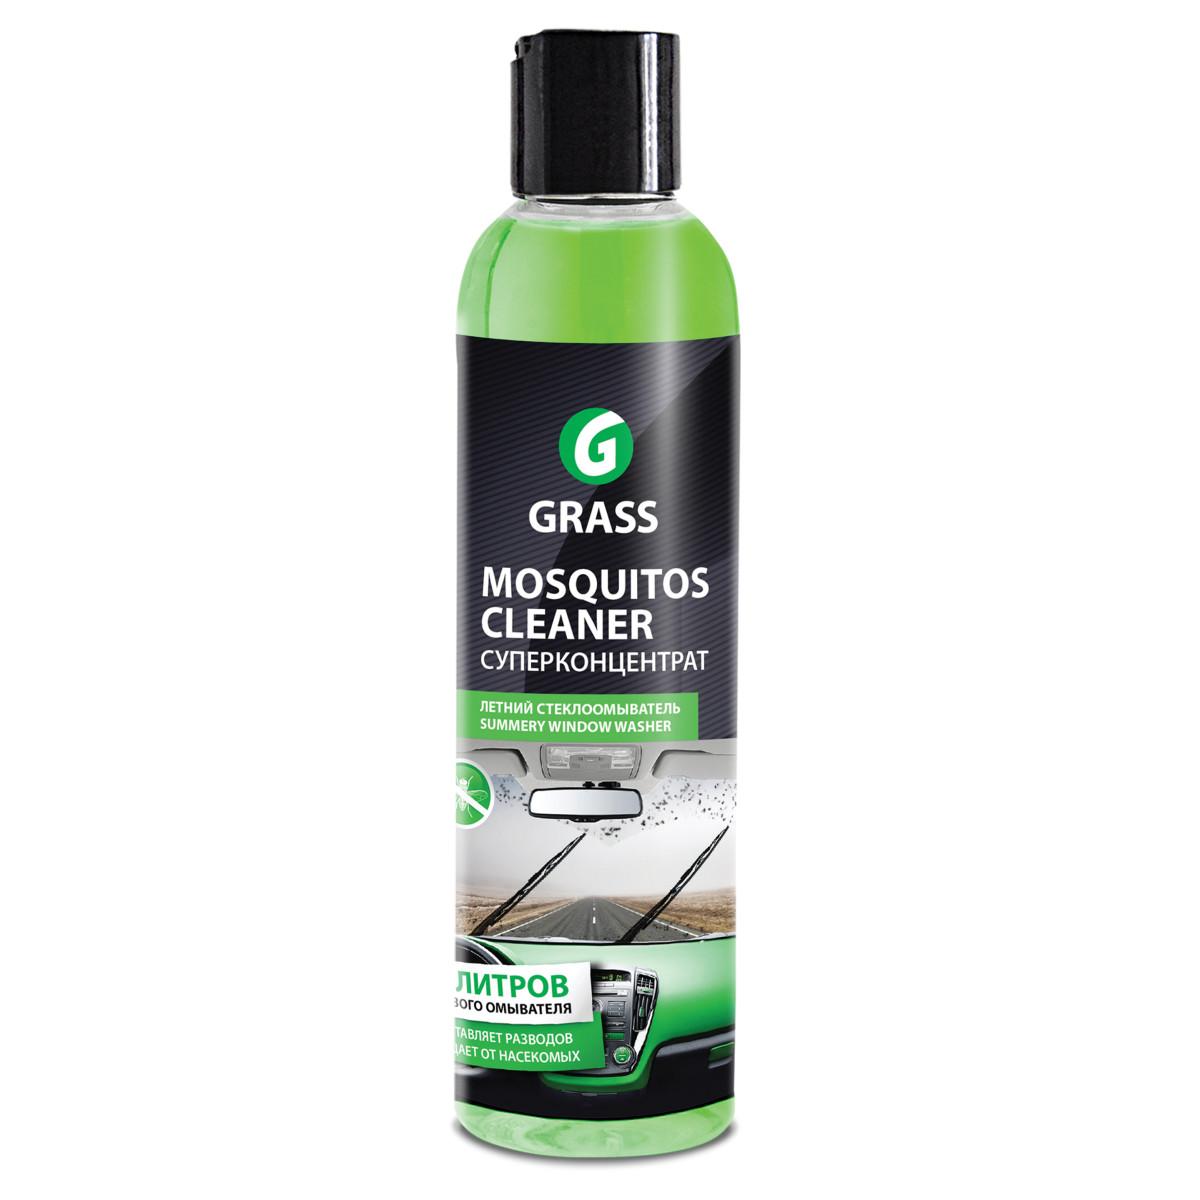 Анти-москитный концентрат Grass Mosquitos Cleaner 0.25 л